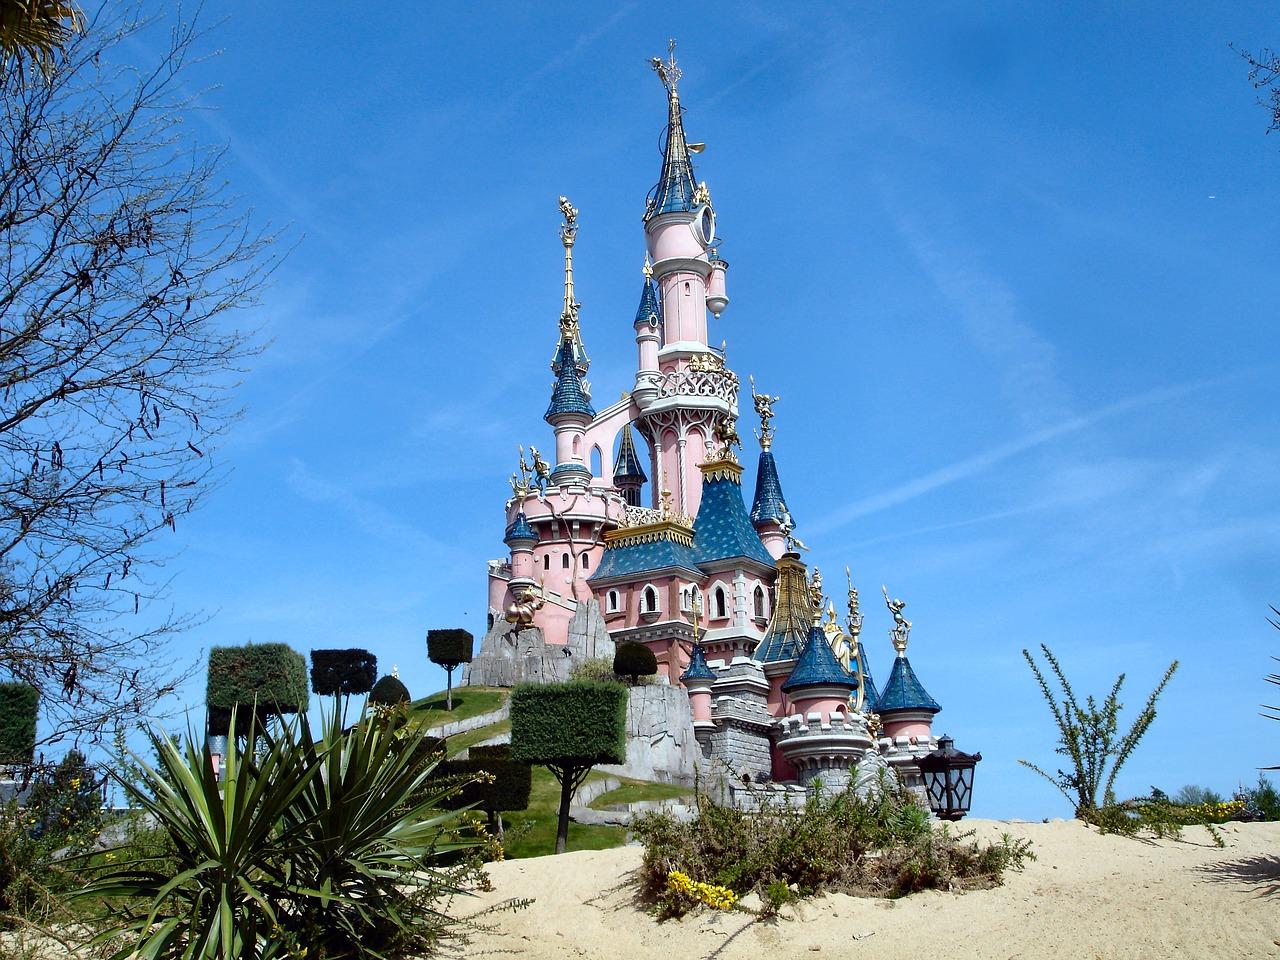 au pays de Disneyland Paris